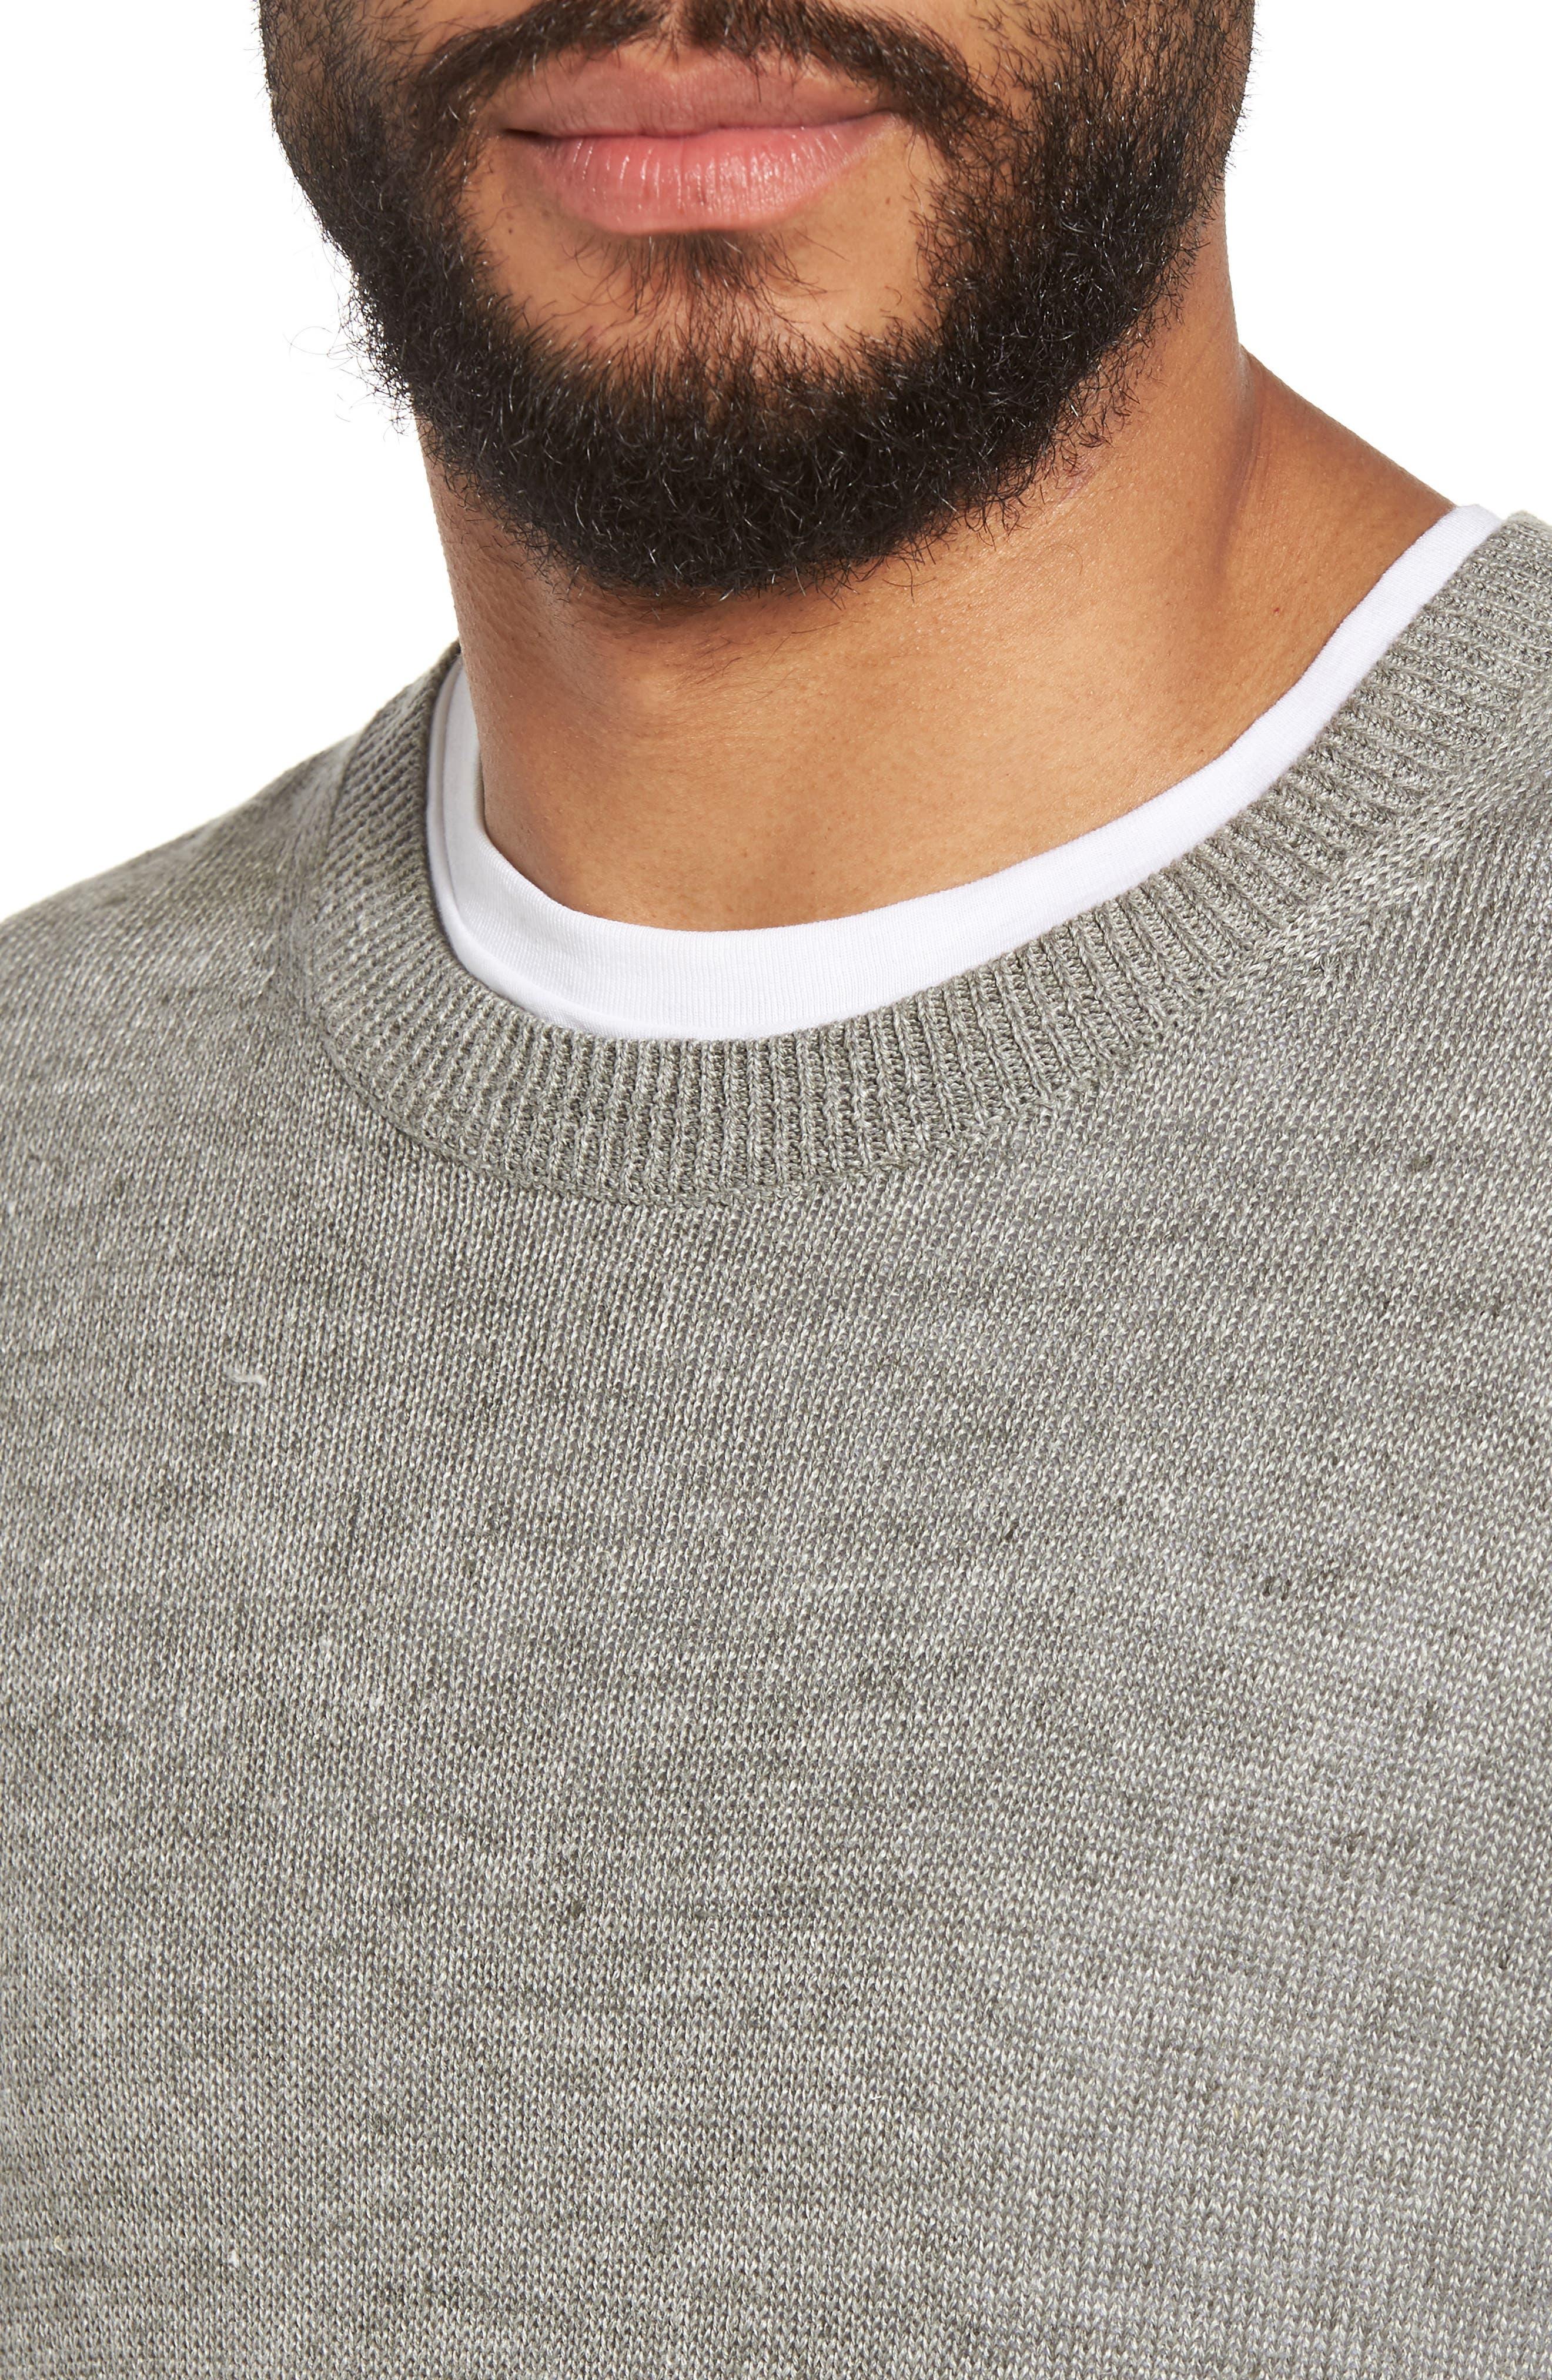 Slim Fit Linen Crewneck Sweater,                             Alternate thumbnail 4, color,                             Silver